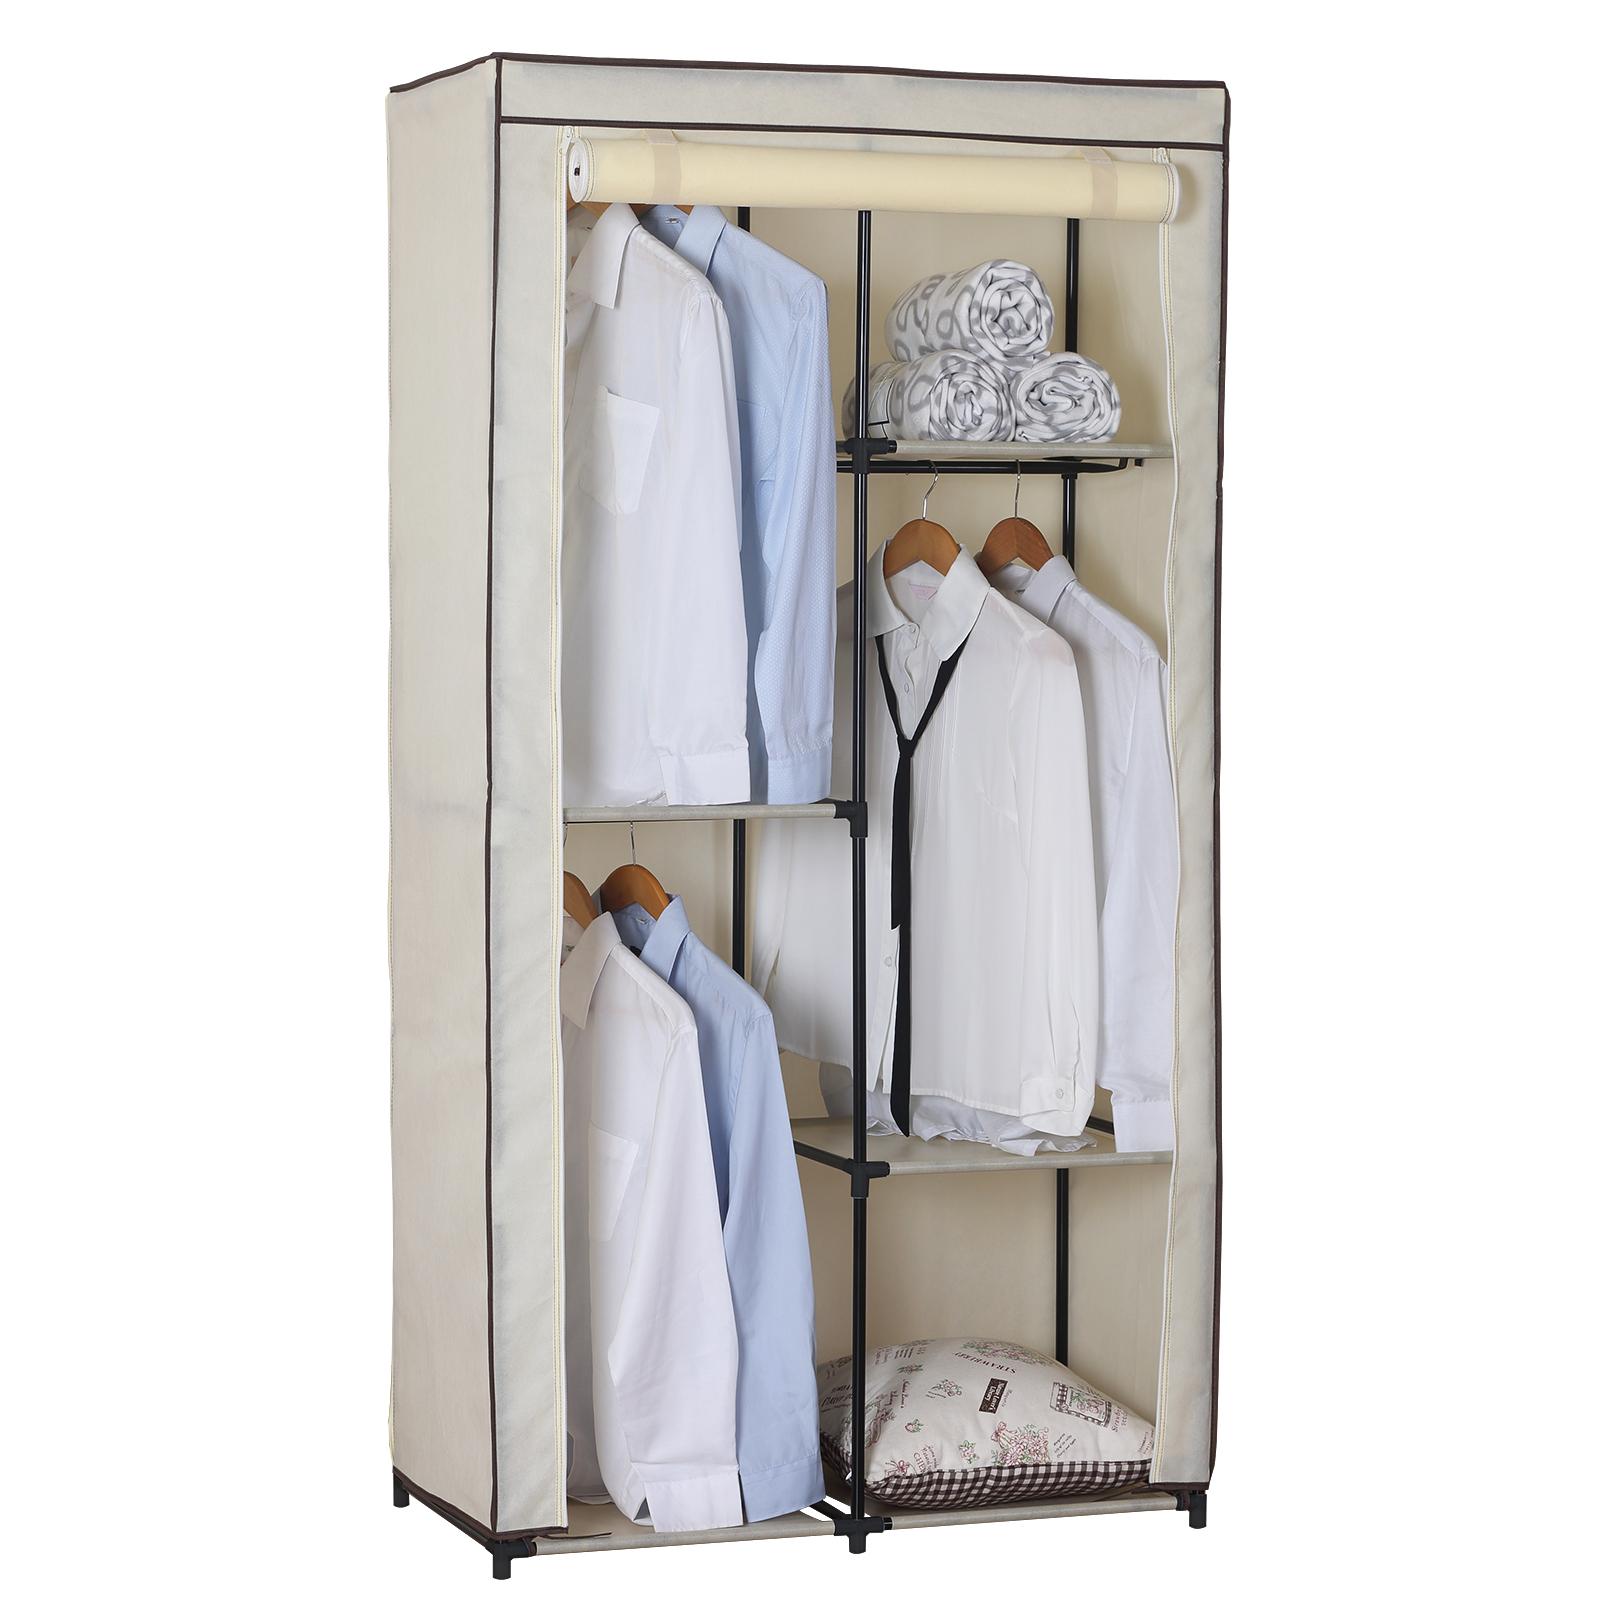 Kleiderschrank Garderobenschrank Campingschrank Faltschrank Stoff ...